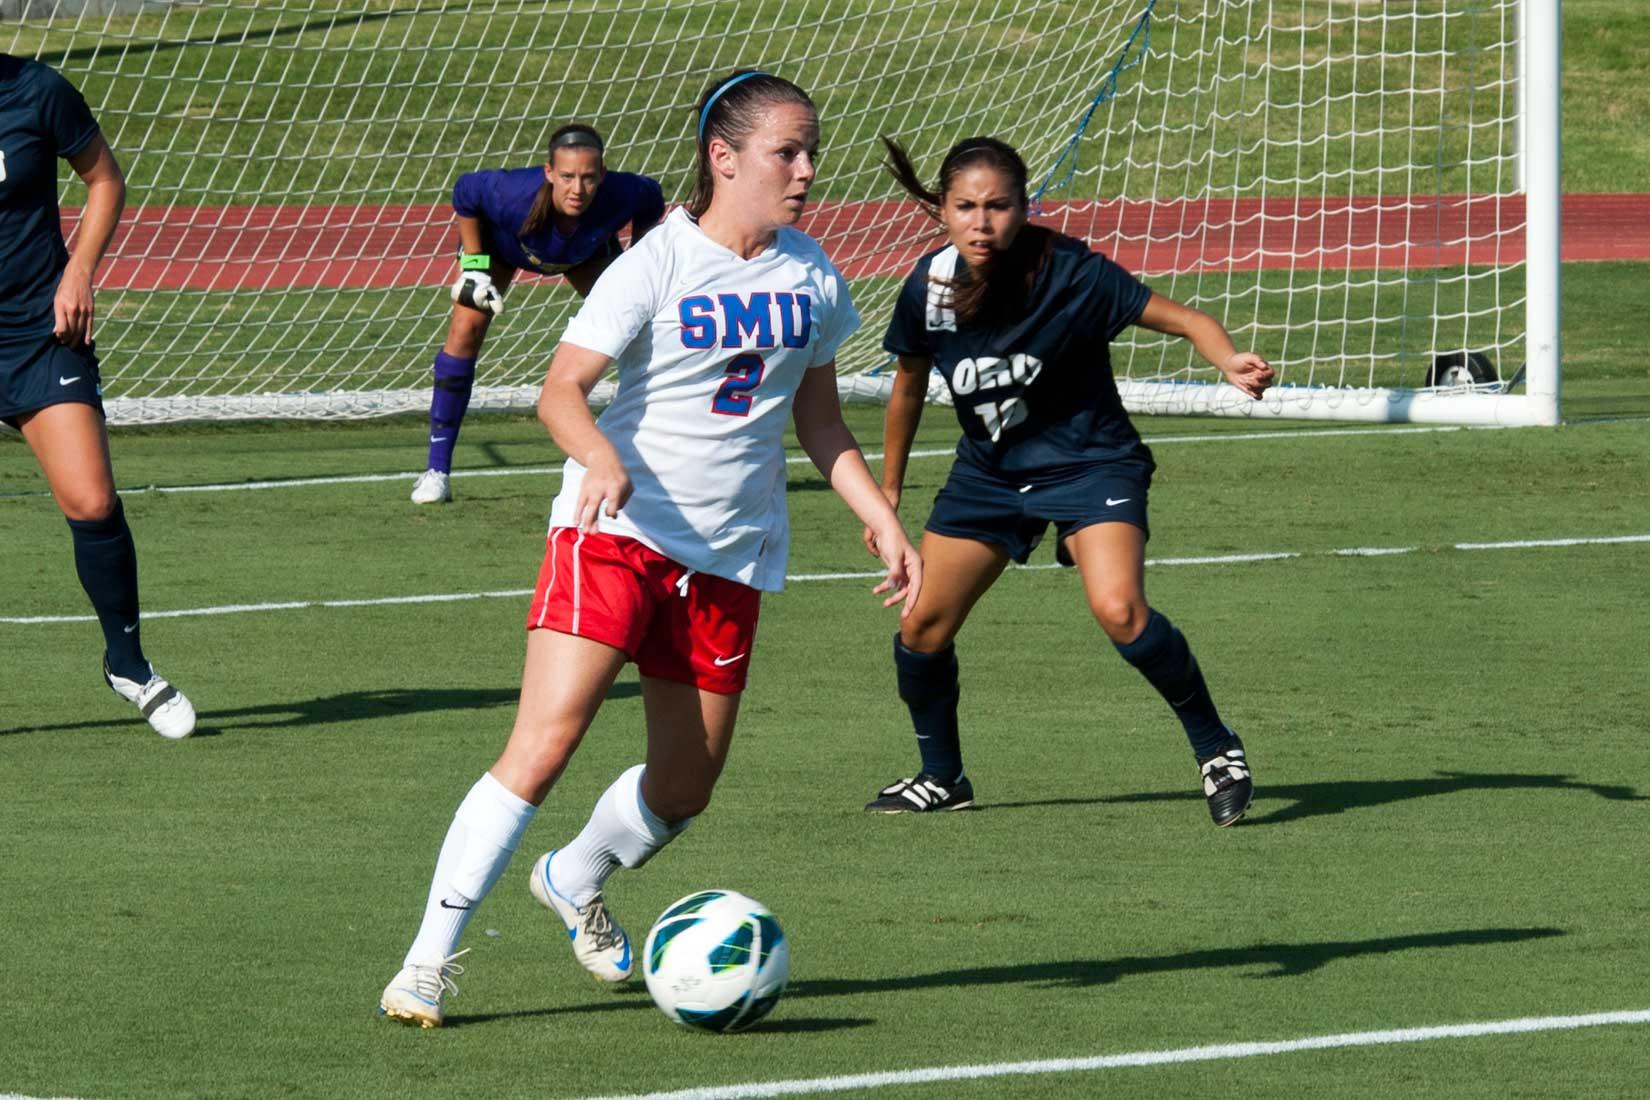 SMU Soccer vs. Oral Roberts University - Photos by Doug Fejer Soccer 24